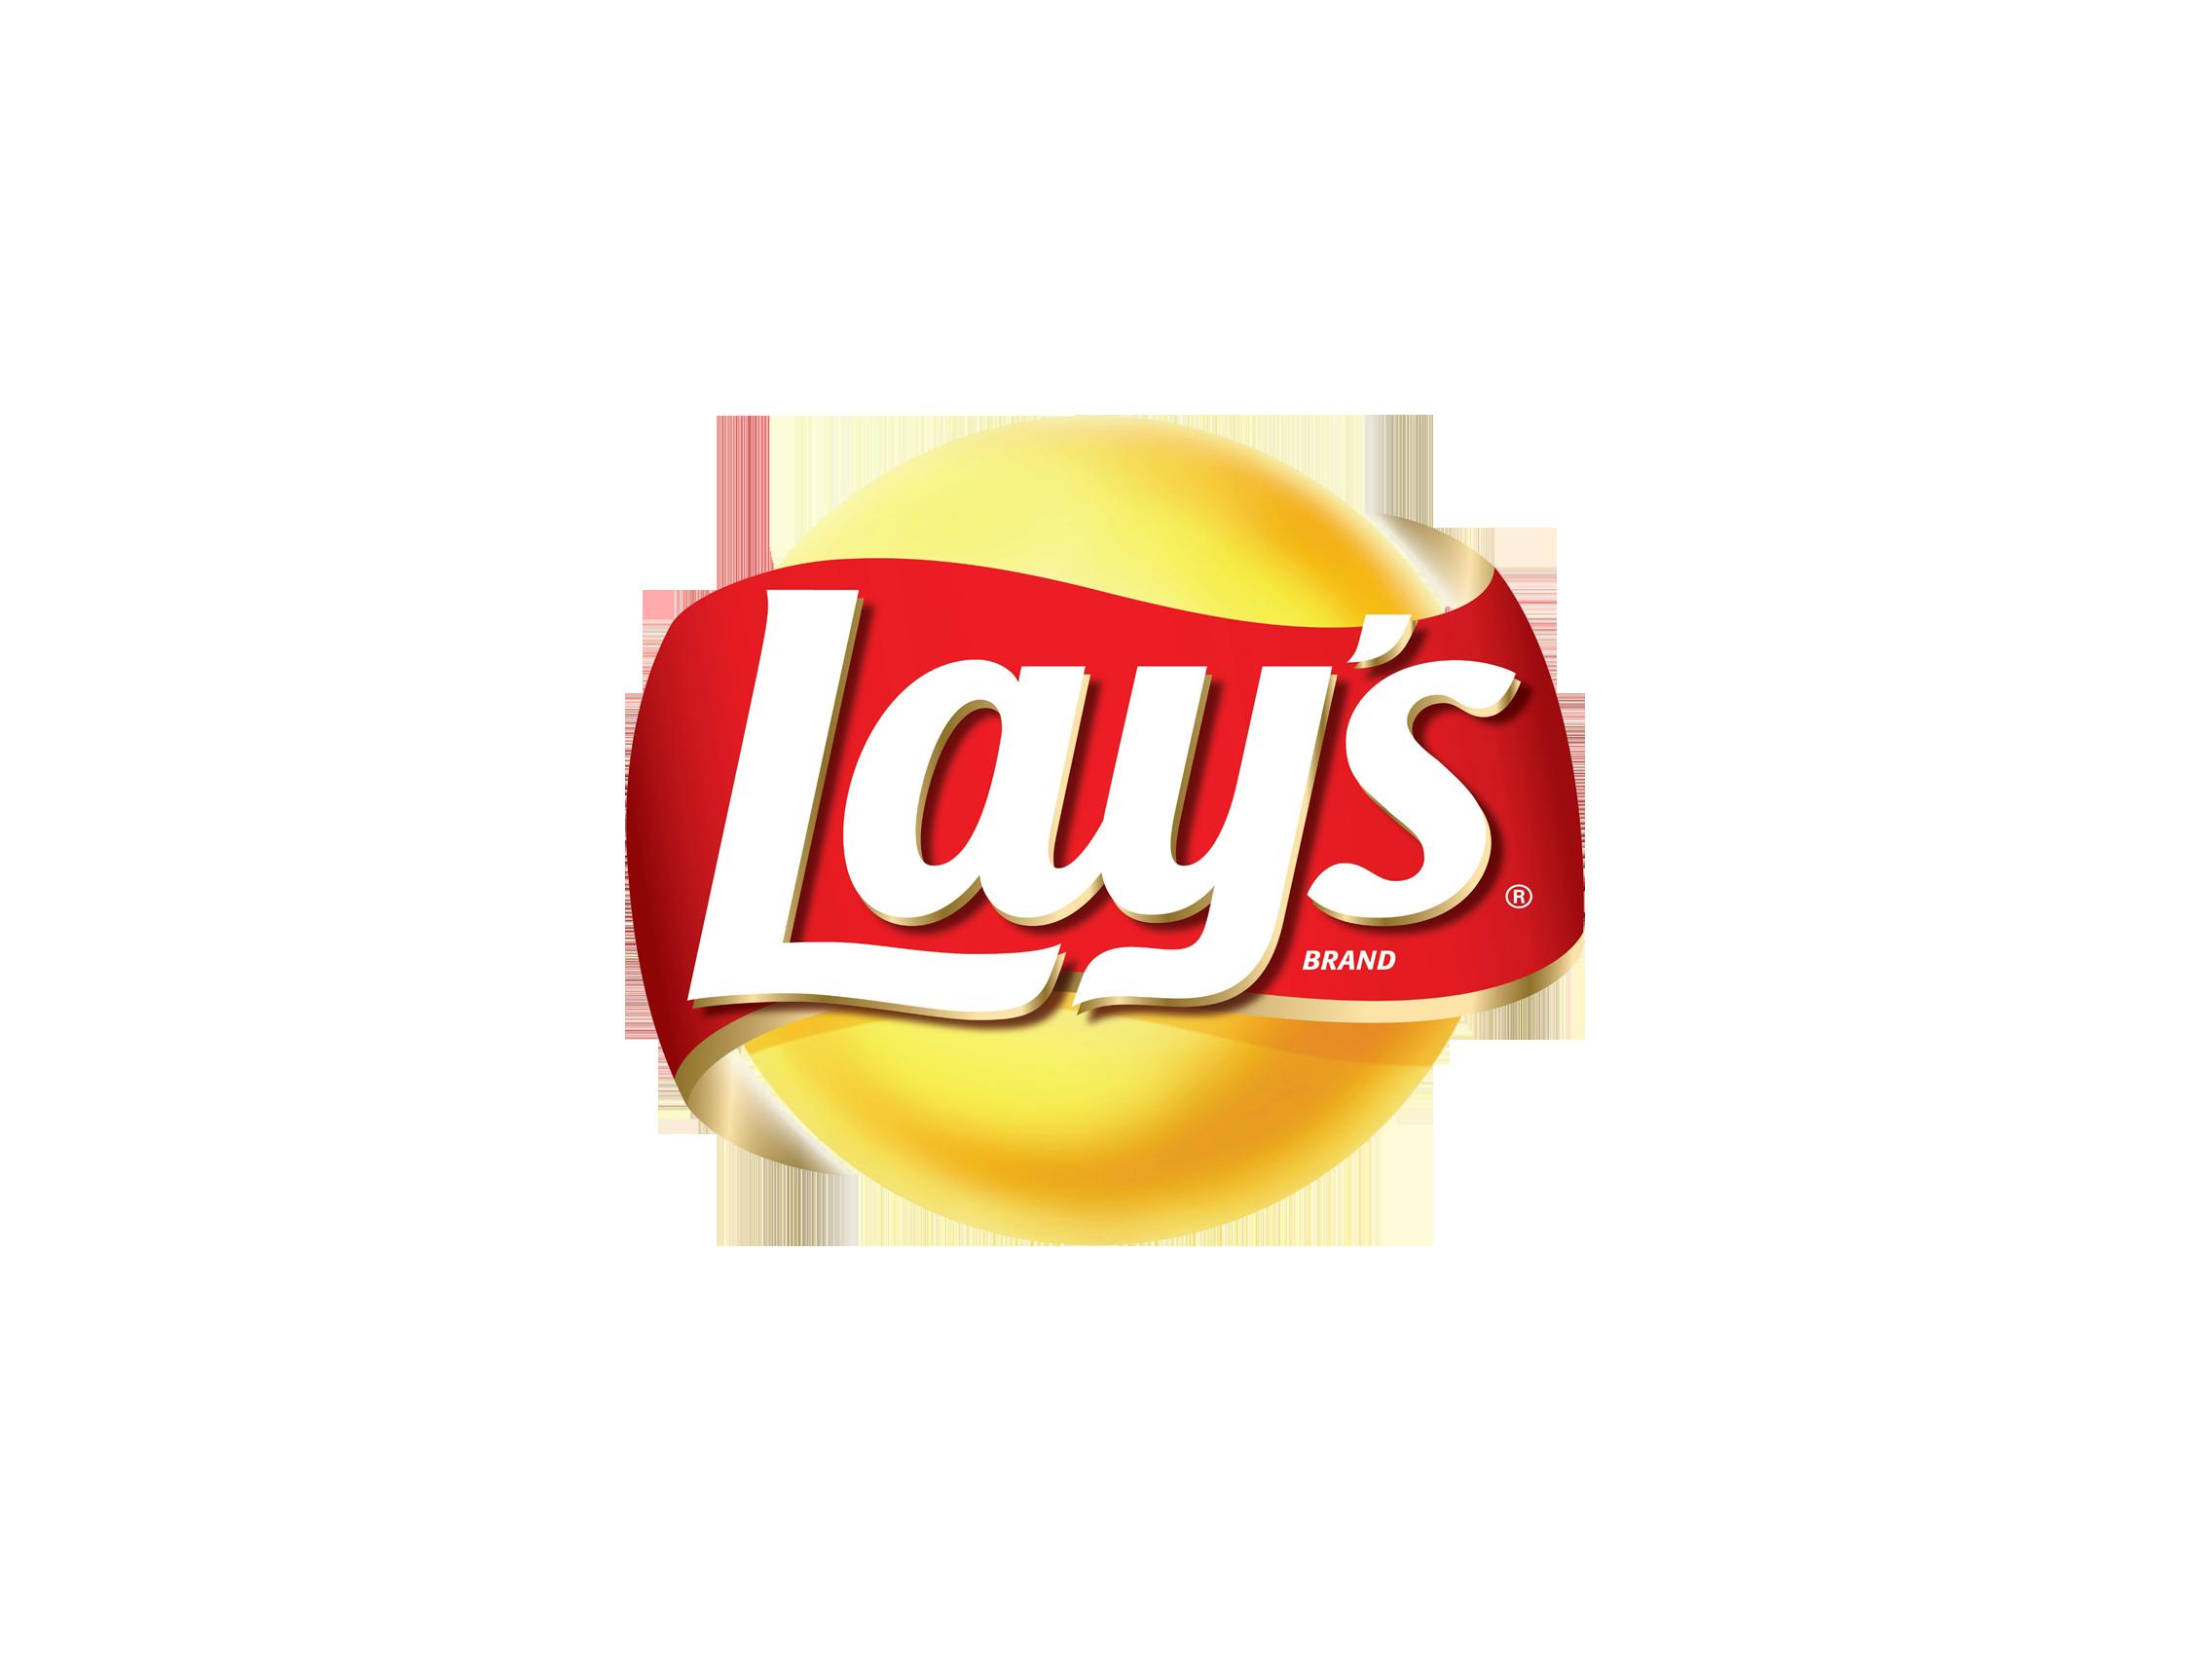 Image Result For Twix Logo 2016 Brand Names Pinterest Gluten